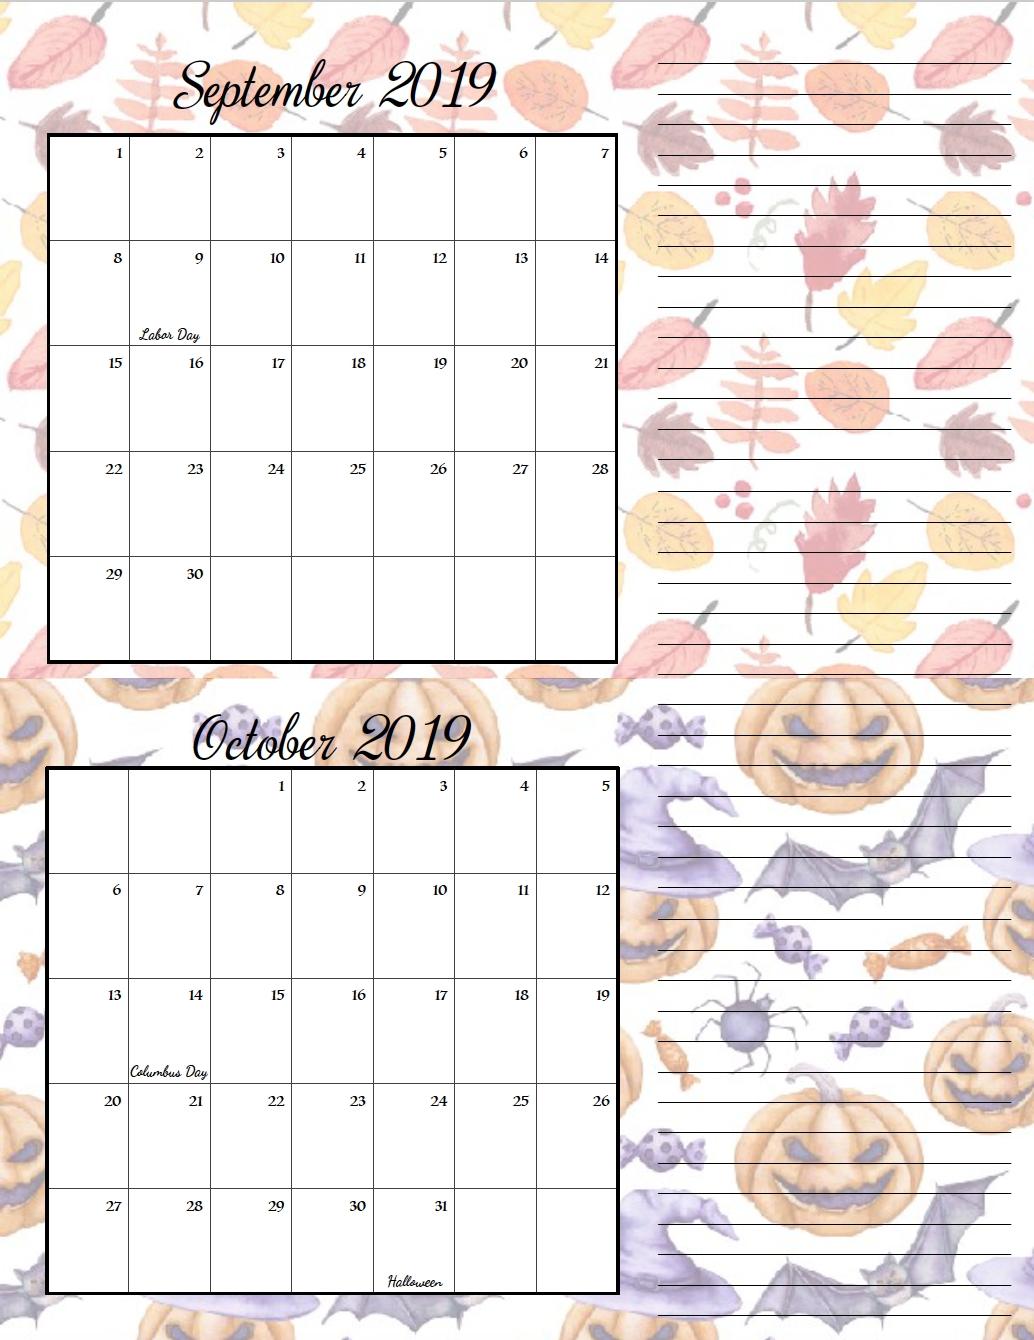 Free Printable 2019 Bimonthly Calendars: 2 Designs | Free